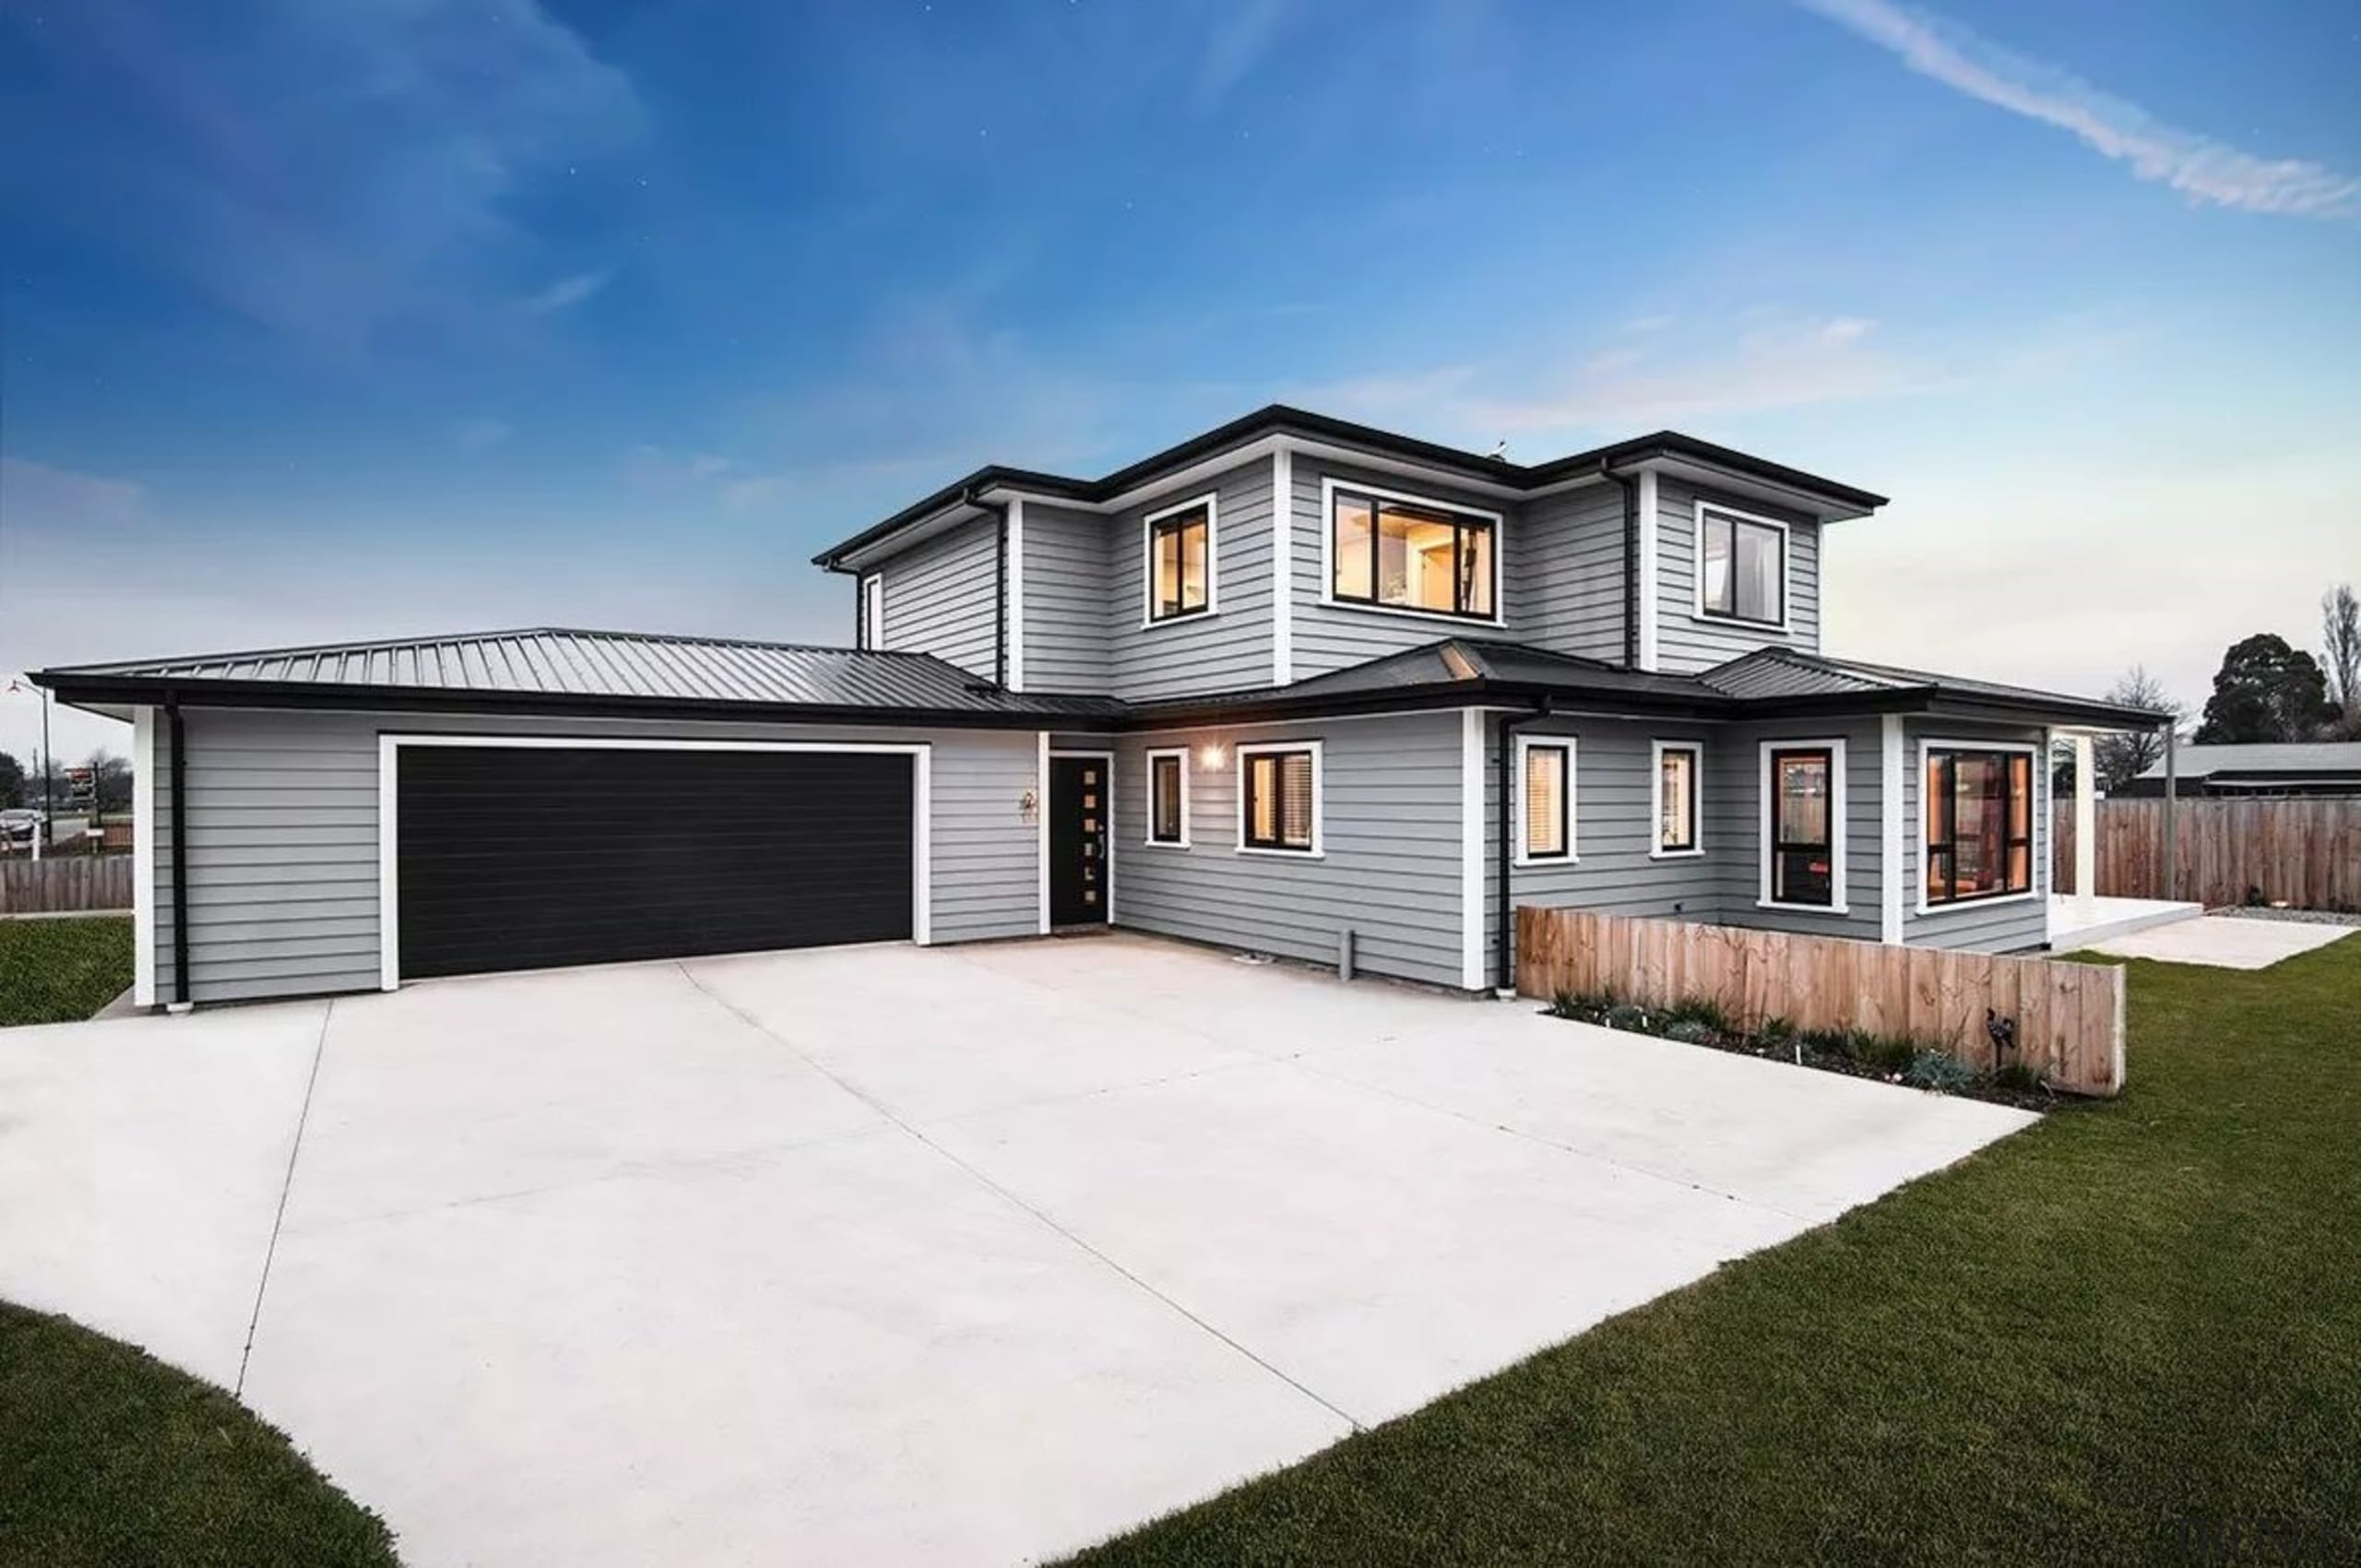 Envira bevel back weatherboards - Envira bevel back elevation, estate, facade, home, house, property, real estate, residential area, siding, white